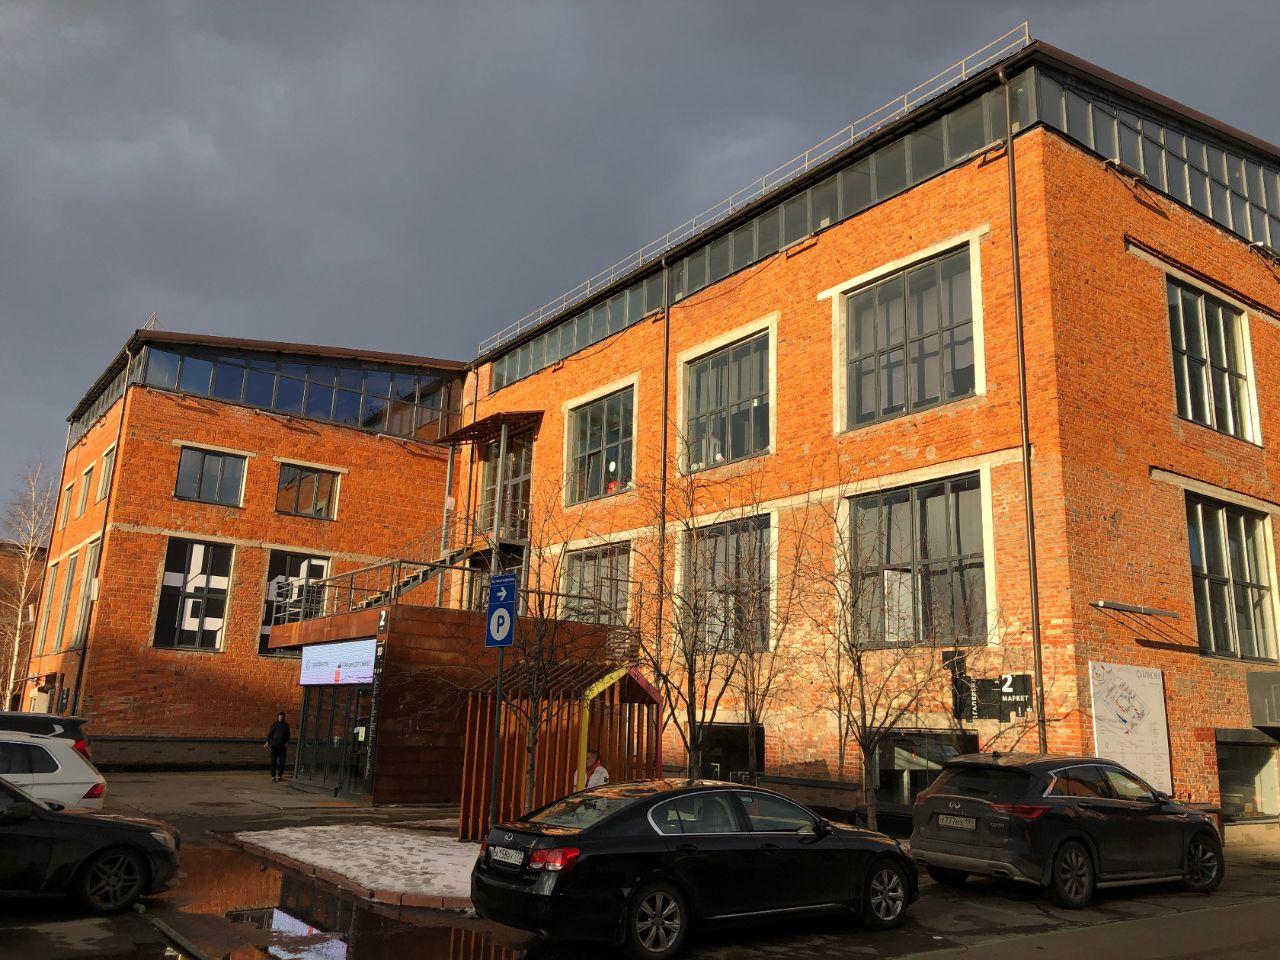 Бизнес Центр Дизайн-завод «Flacon» (Дизайн-завод «Флакон») (36с2)